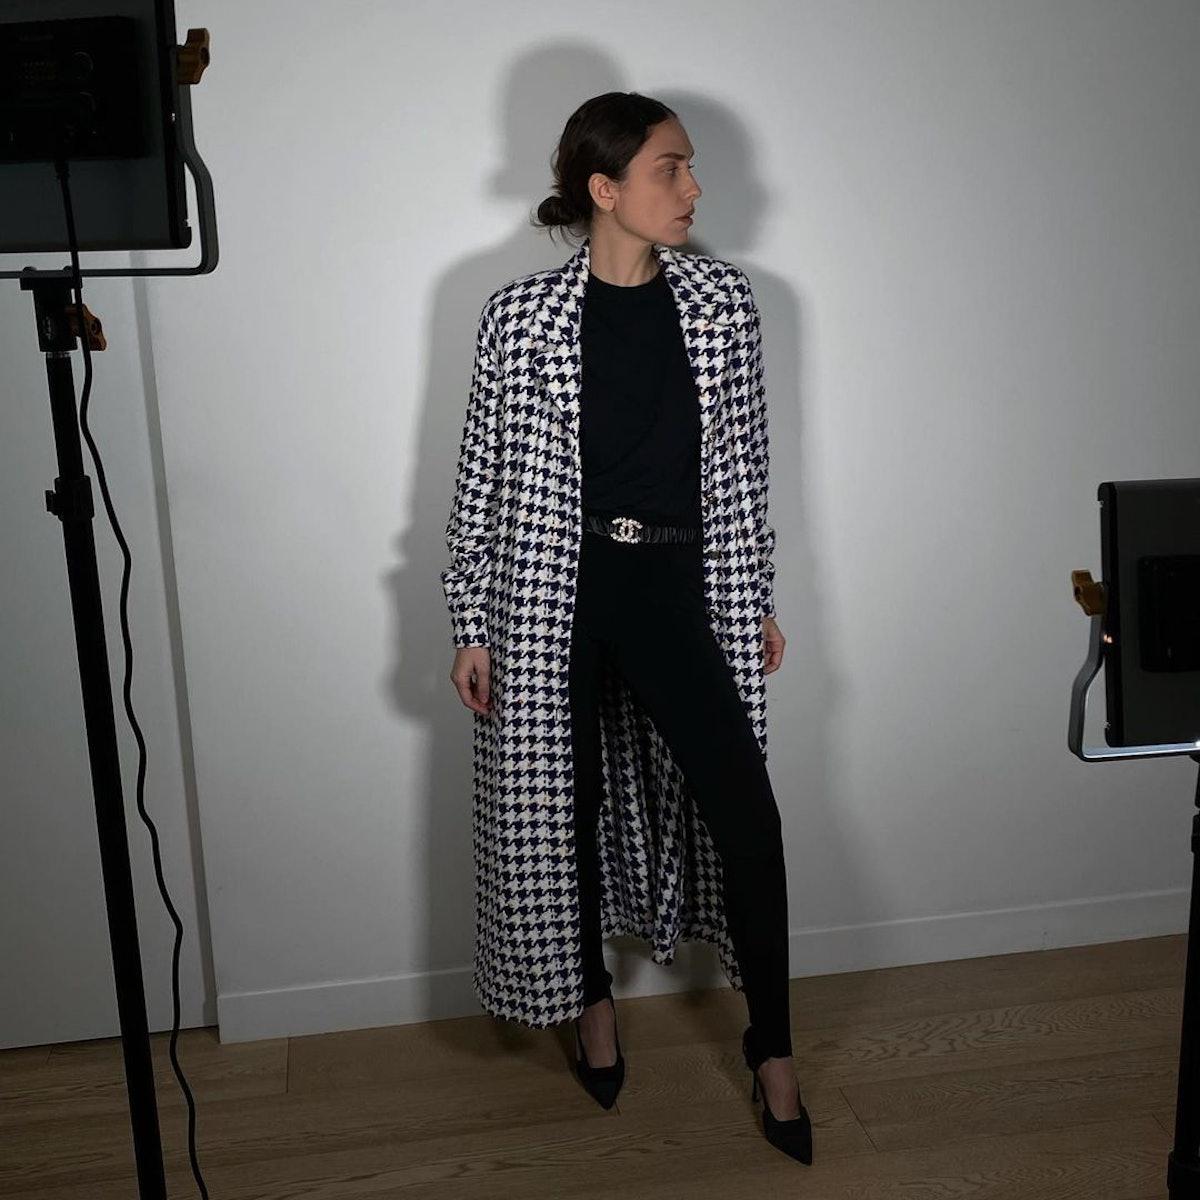 Erika Boldrin at home style.